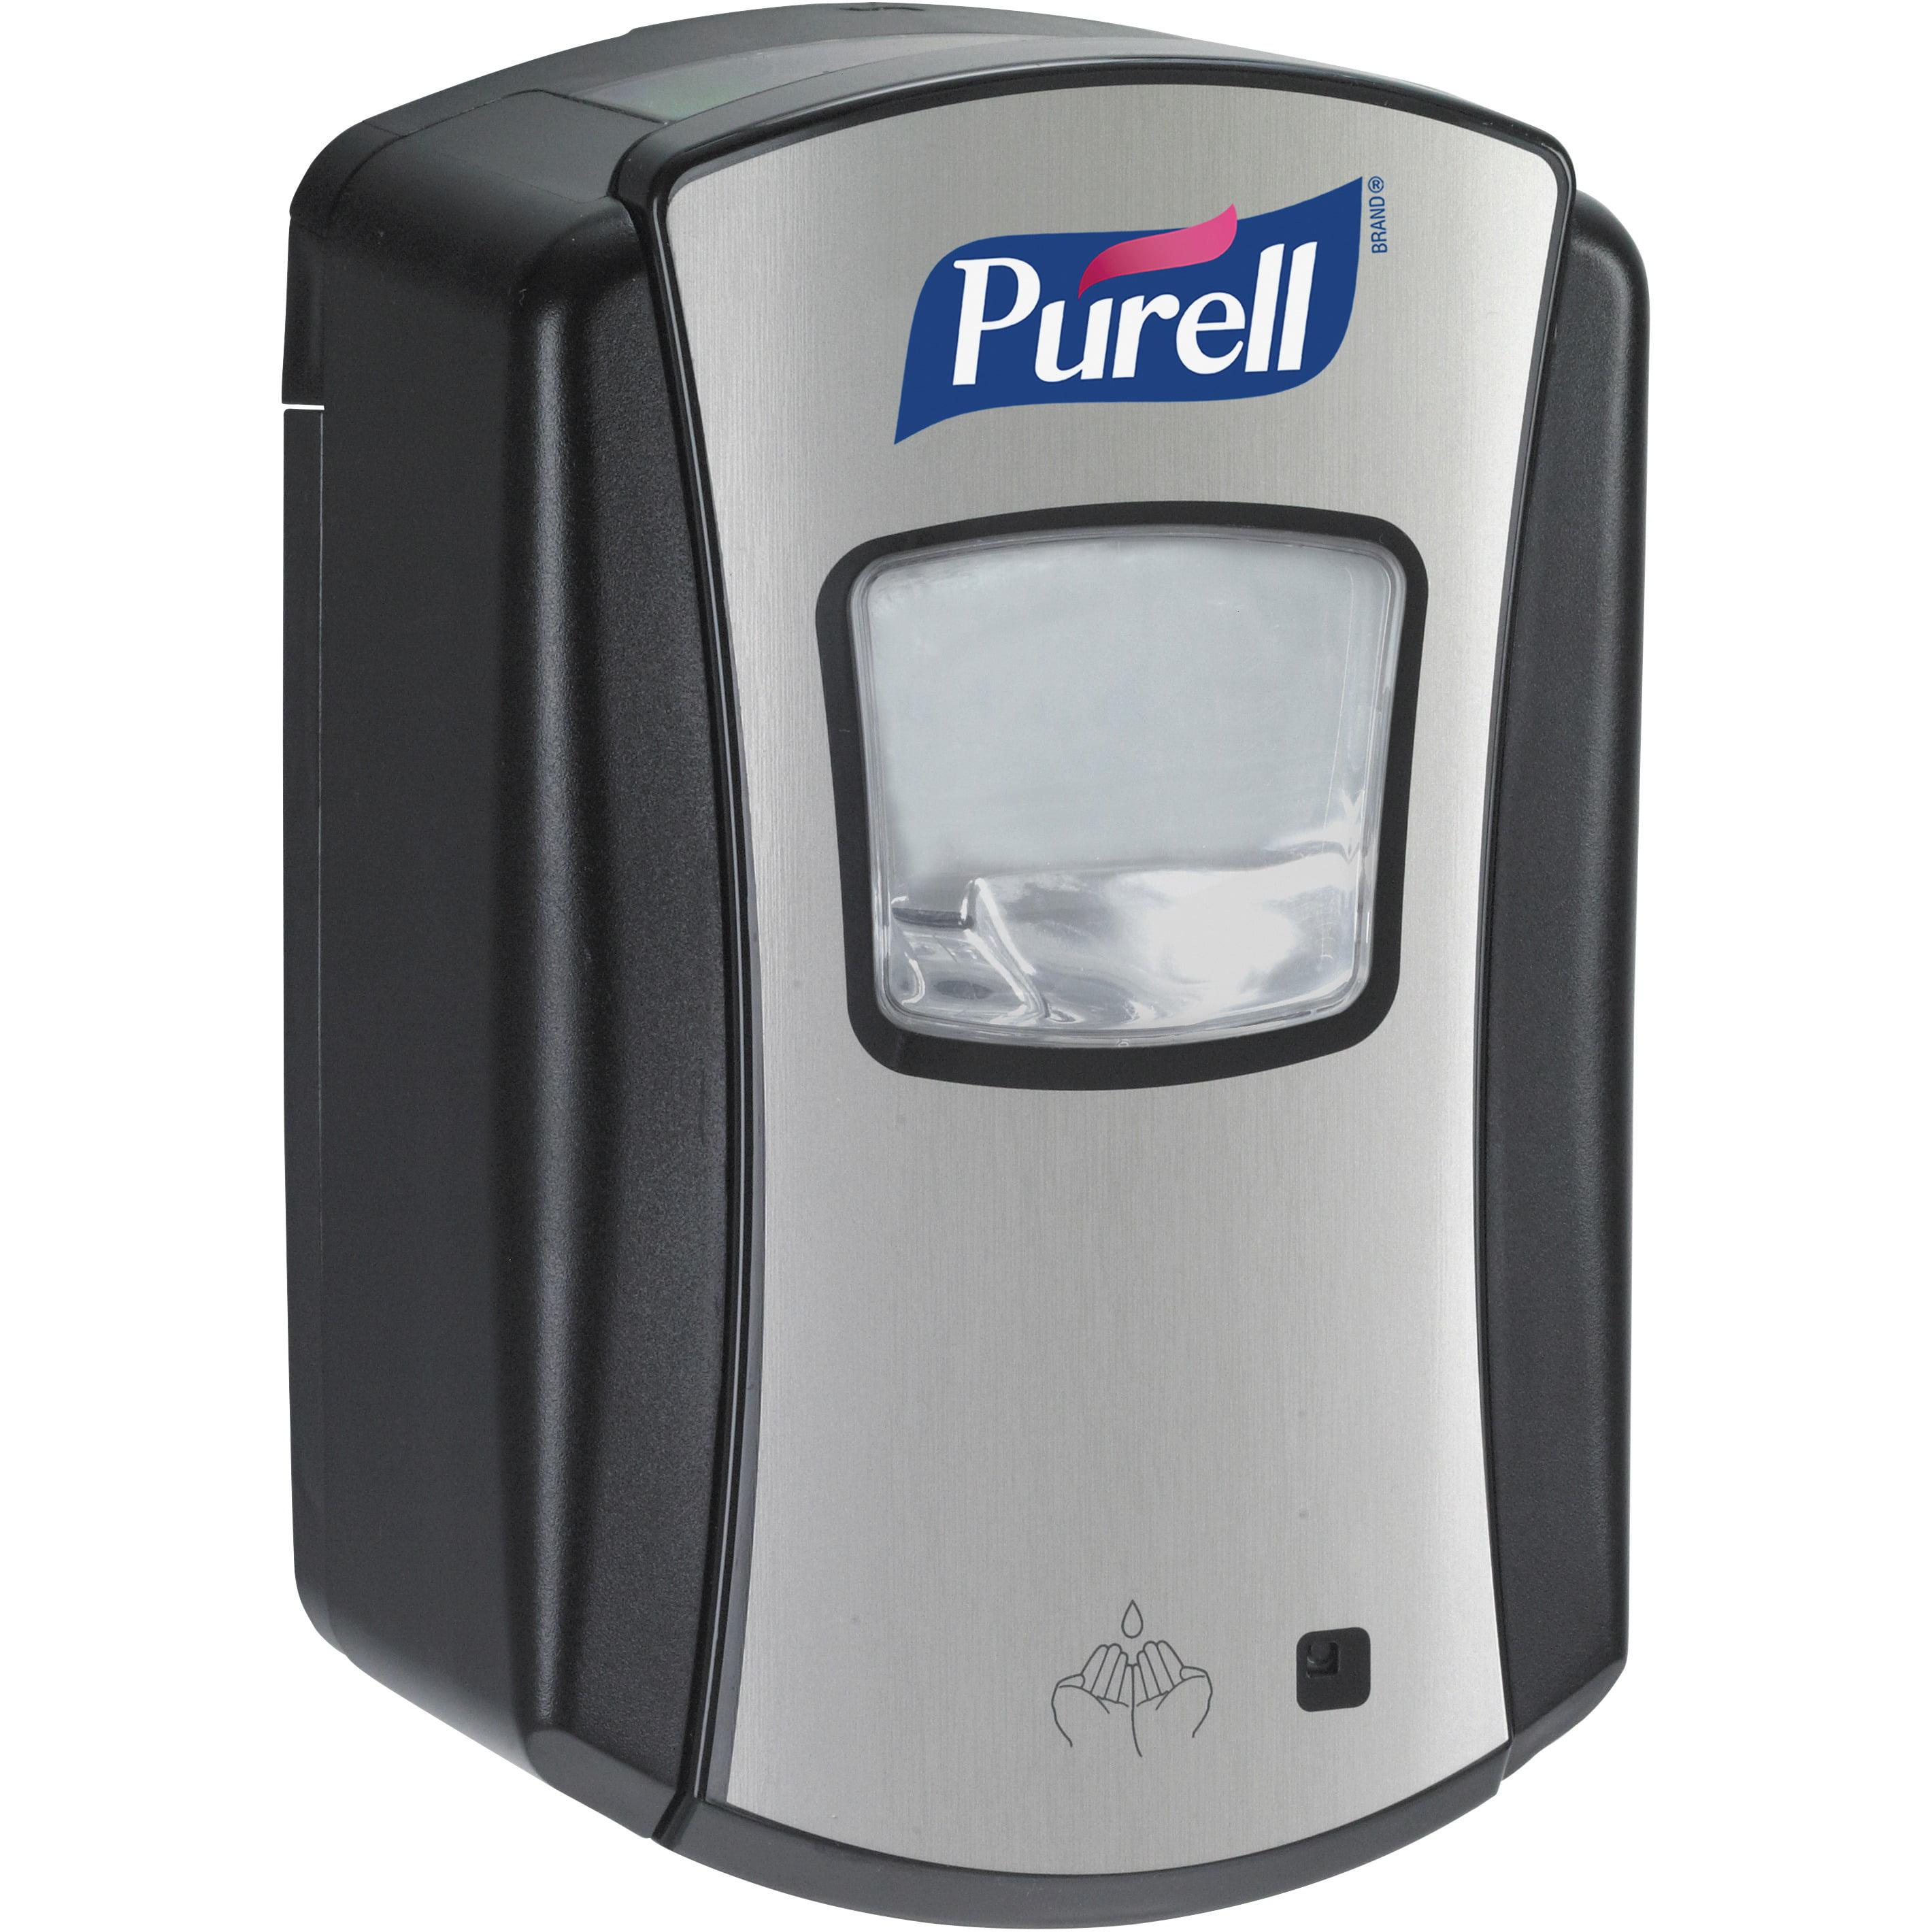 PURELL®, GOJ132804, LTX-7 Hands-free Sanitizer Dispenser, 1 Each, Black,Chrome